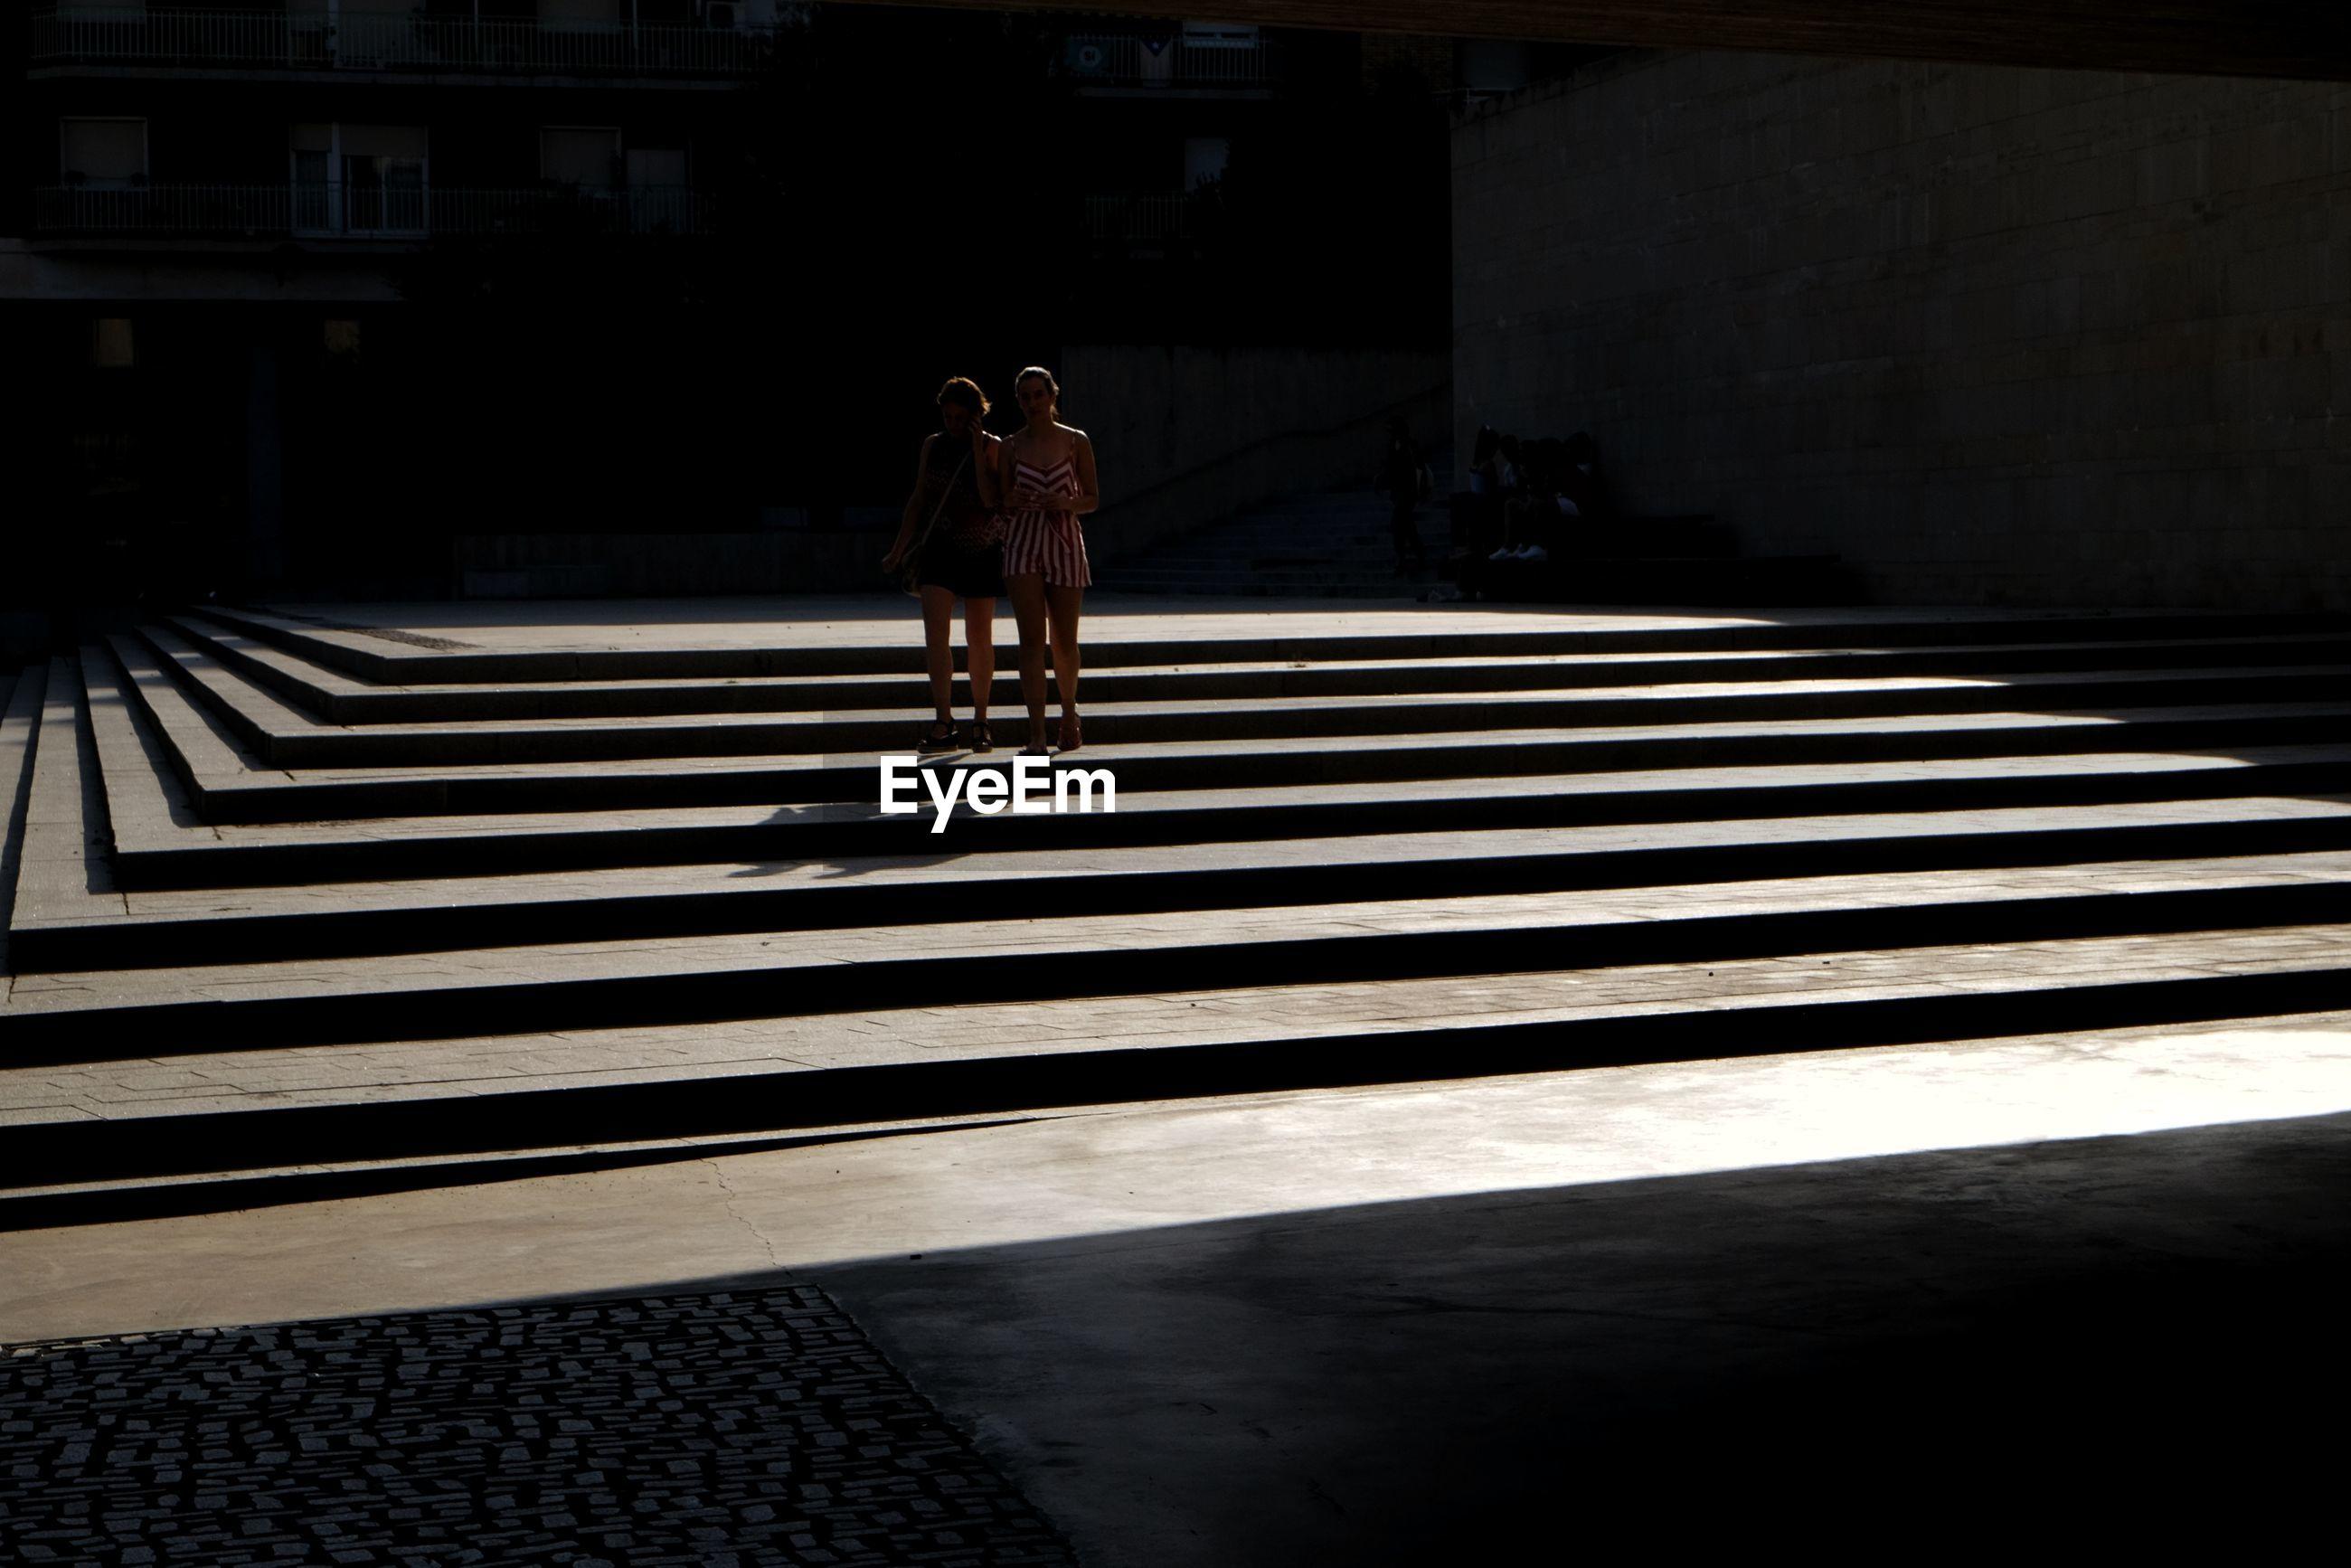 FULL LENGTH REAR VIEW OF CAT WALKING ON ZEBRA CROSSING